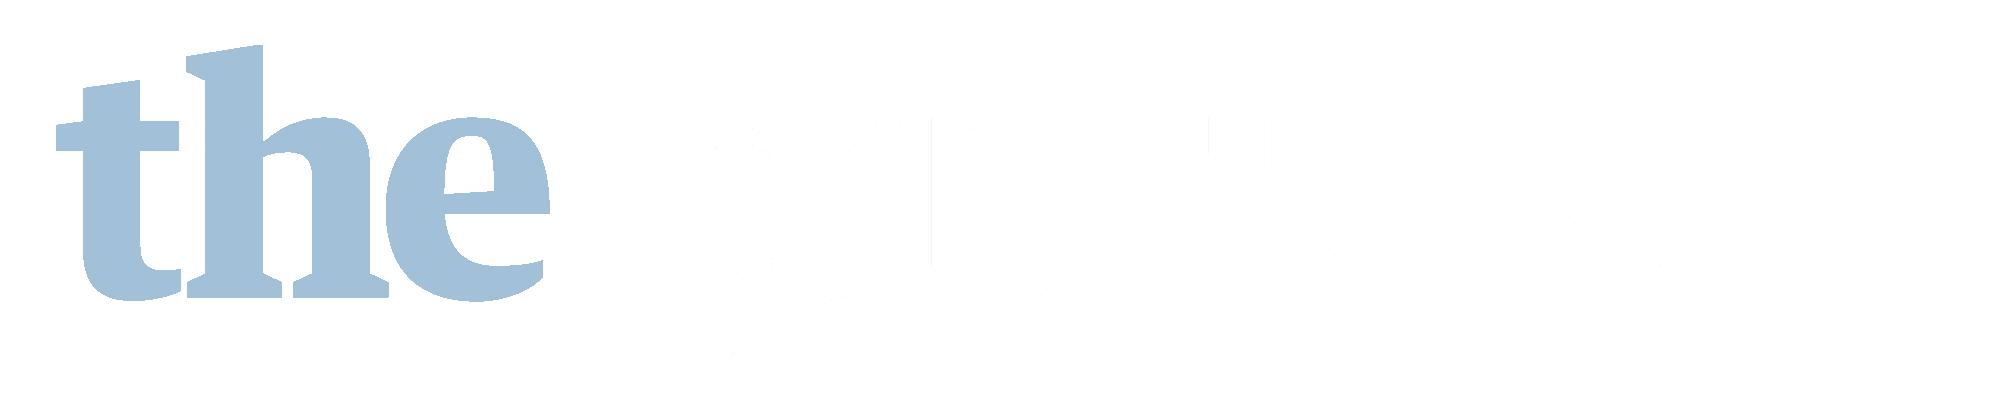 theguardian-logo-4